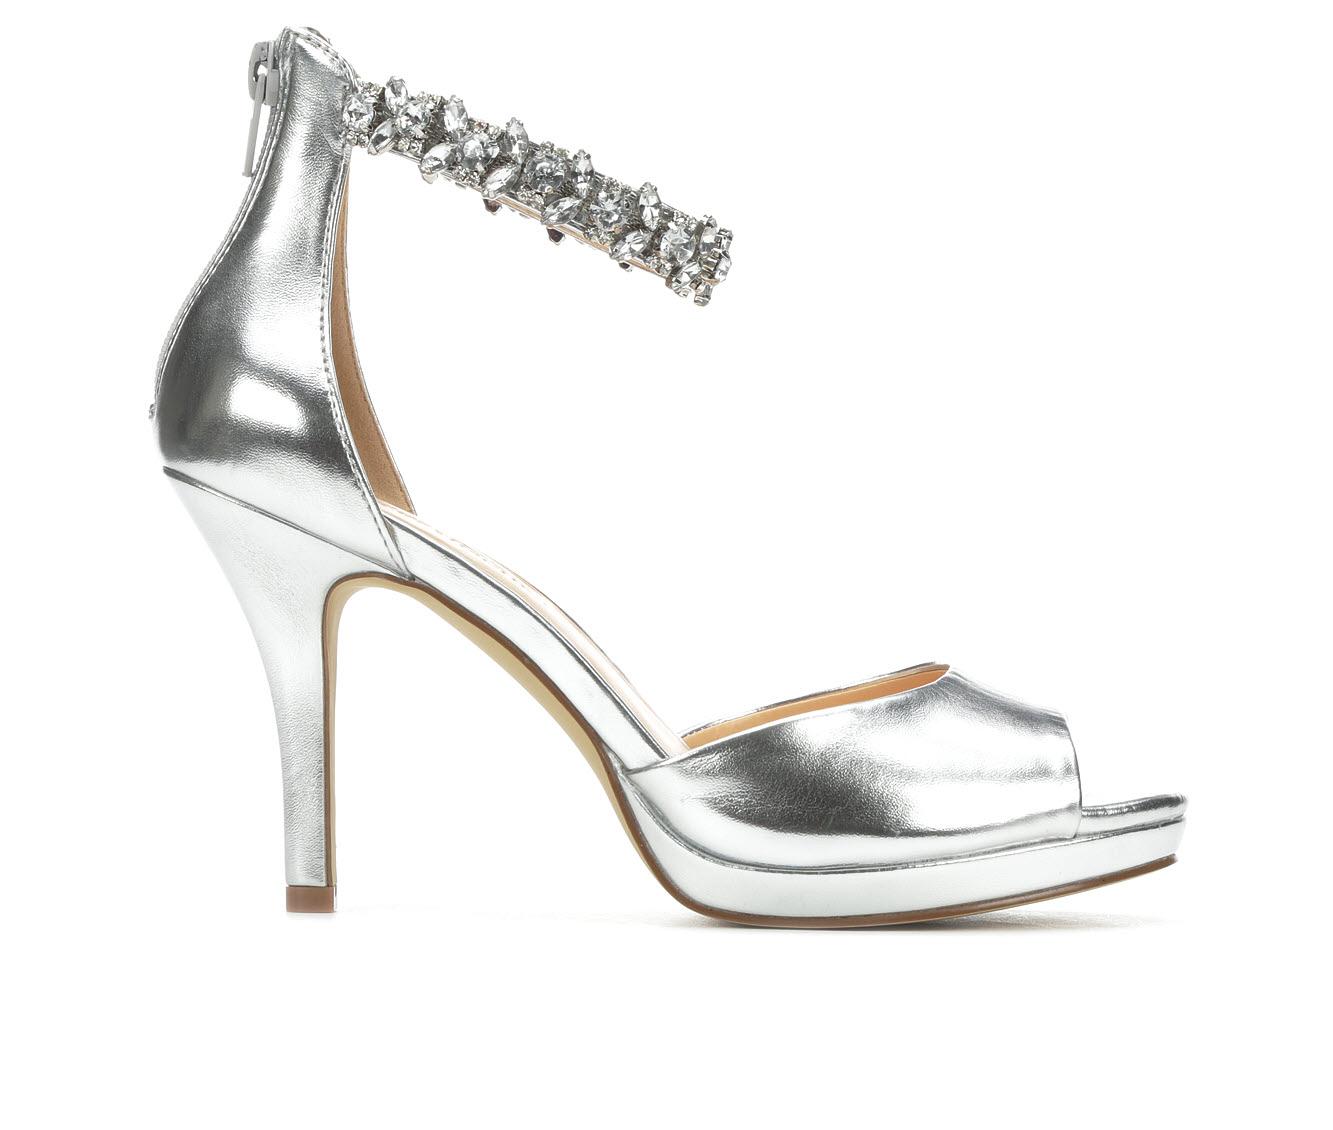 American Glamour BadgleyM Ximena Women's Dress Shoe (Silver Canvas)